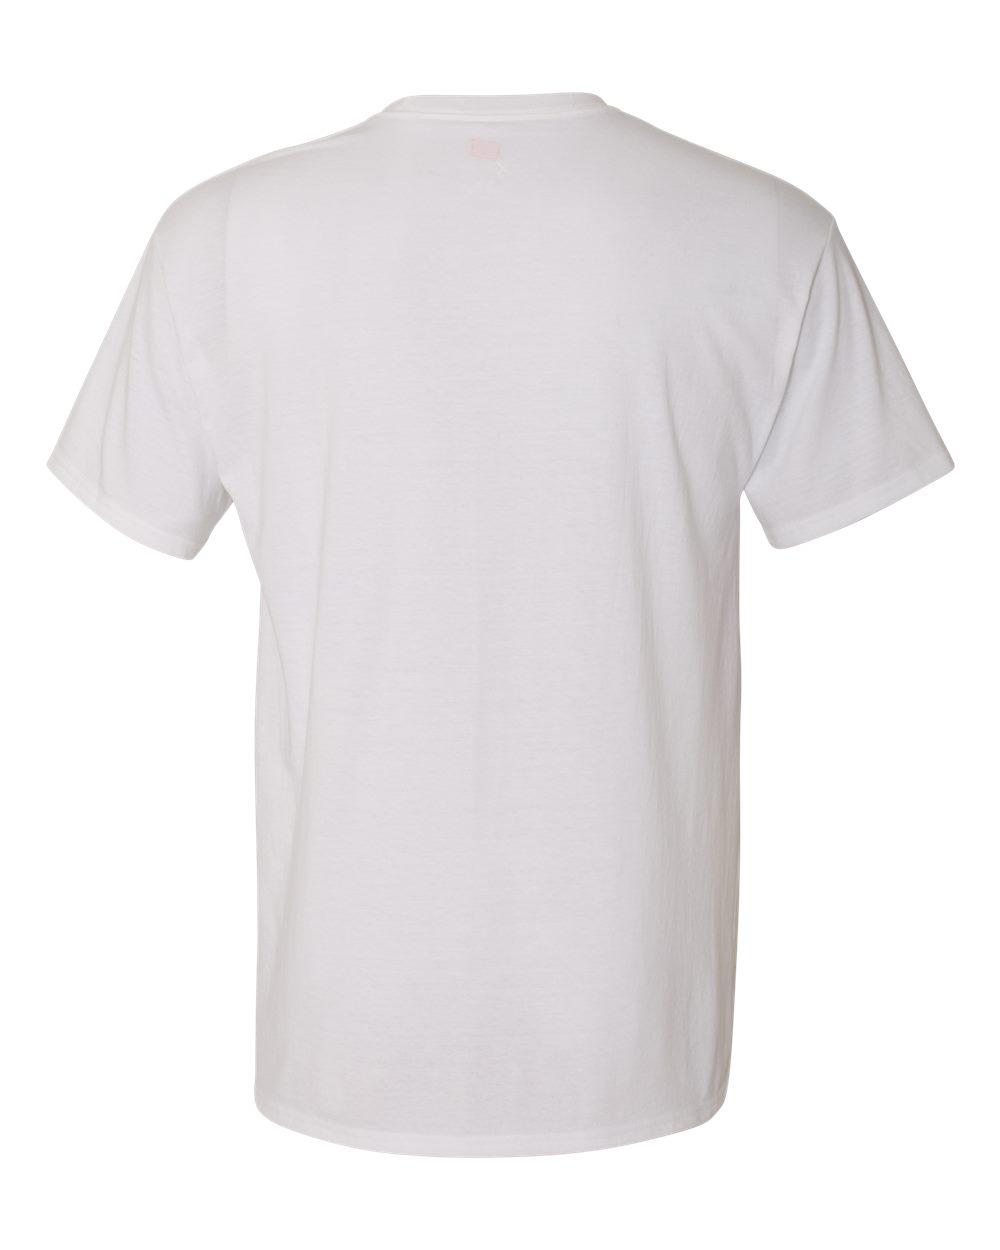 Hanes-Men-039-s-X-Temp-Triblend-T-Shirt-With-Fresh-Iq-42TB-S-3XL thumbnail 34